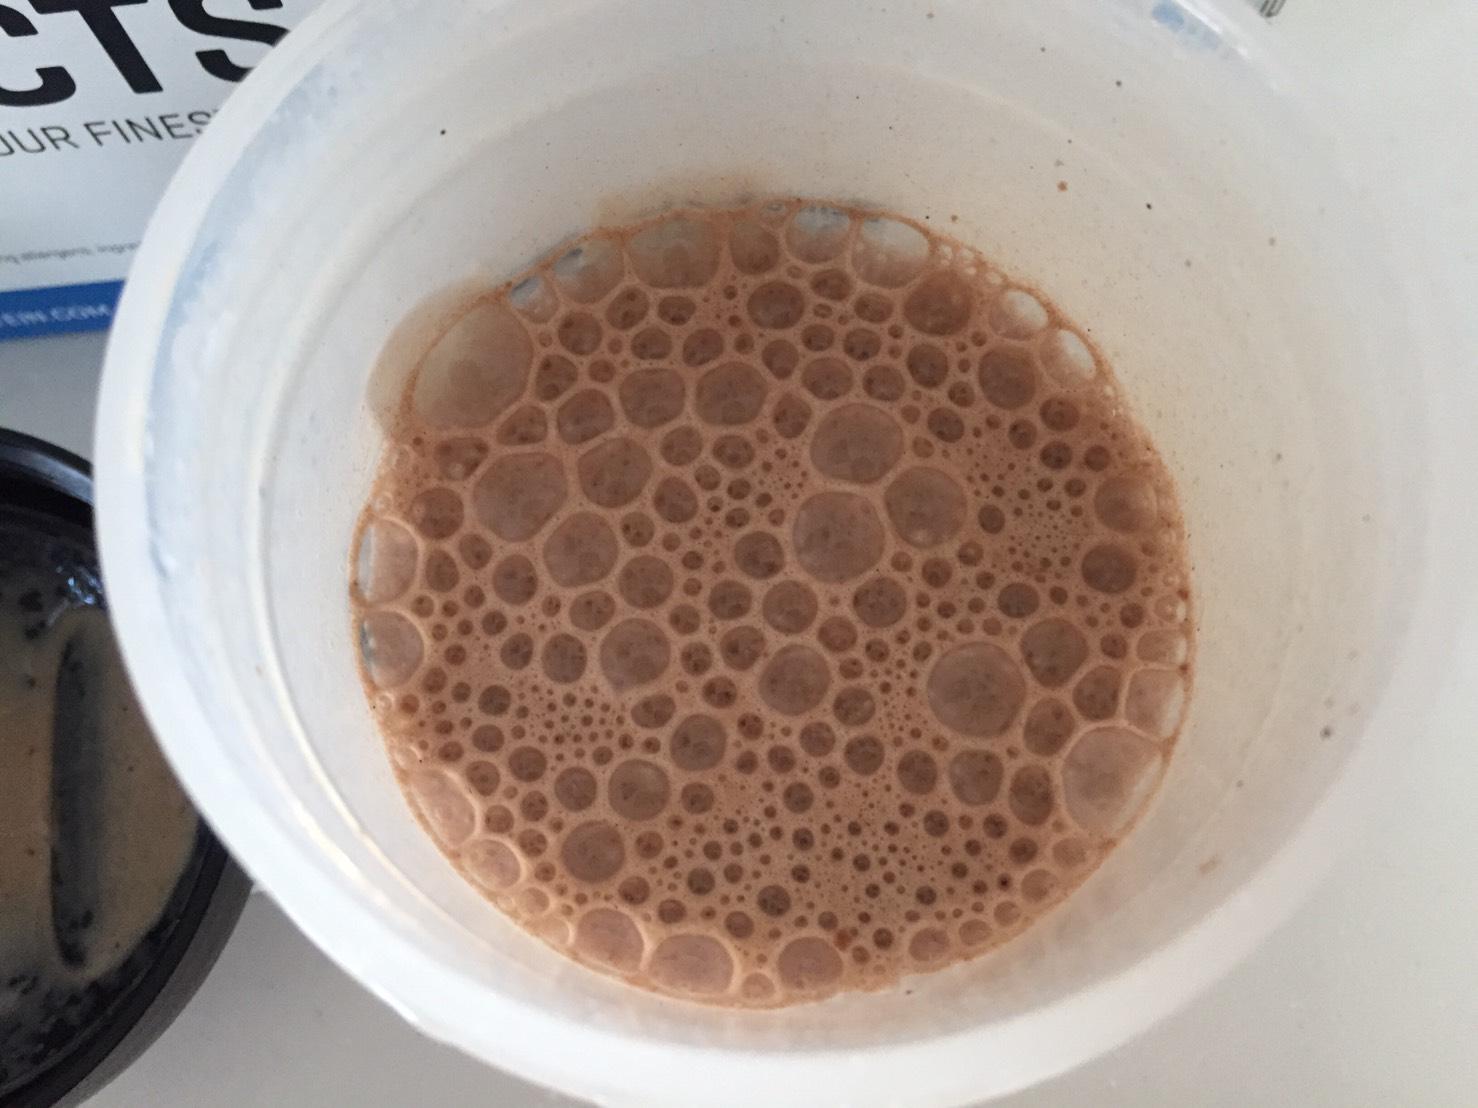 【WPC】Impactホエイプロテイン「Chocolate Brownie(チョコレートブラウニー味)」を牛乳で溶かした時の様子